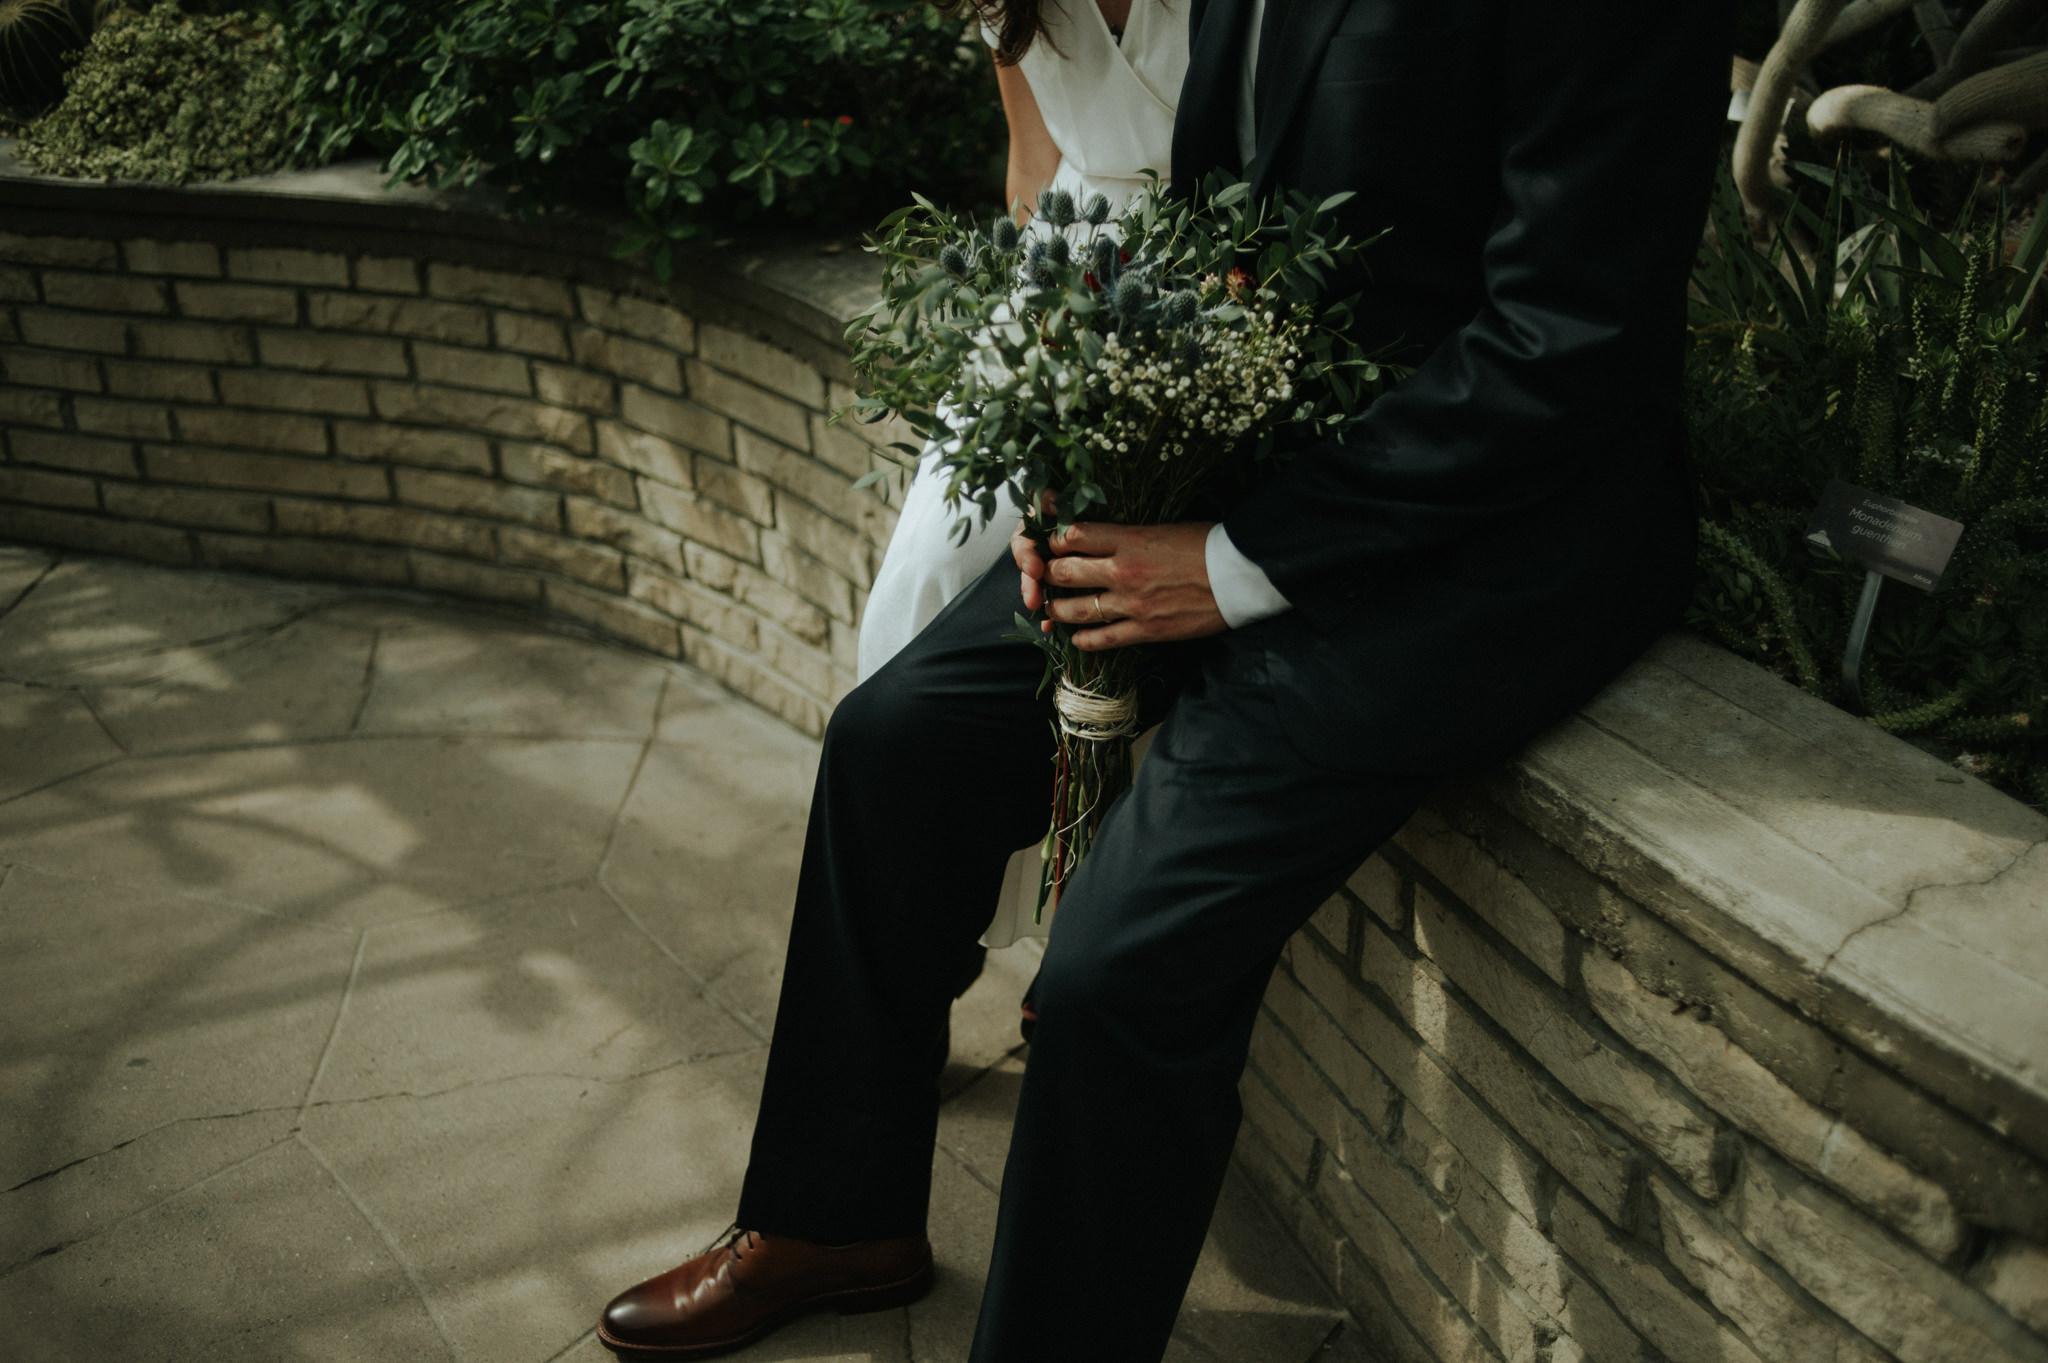 Secret Allan Gardens elopement in Toronto // Daring Wanderer: www.daringwanderer.com